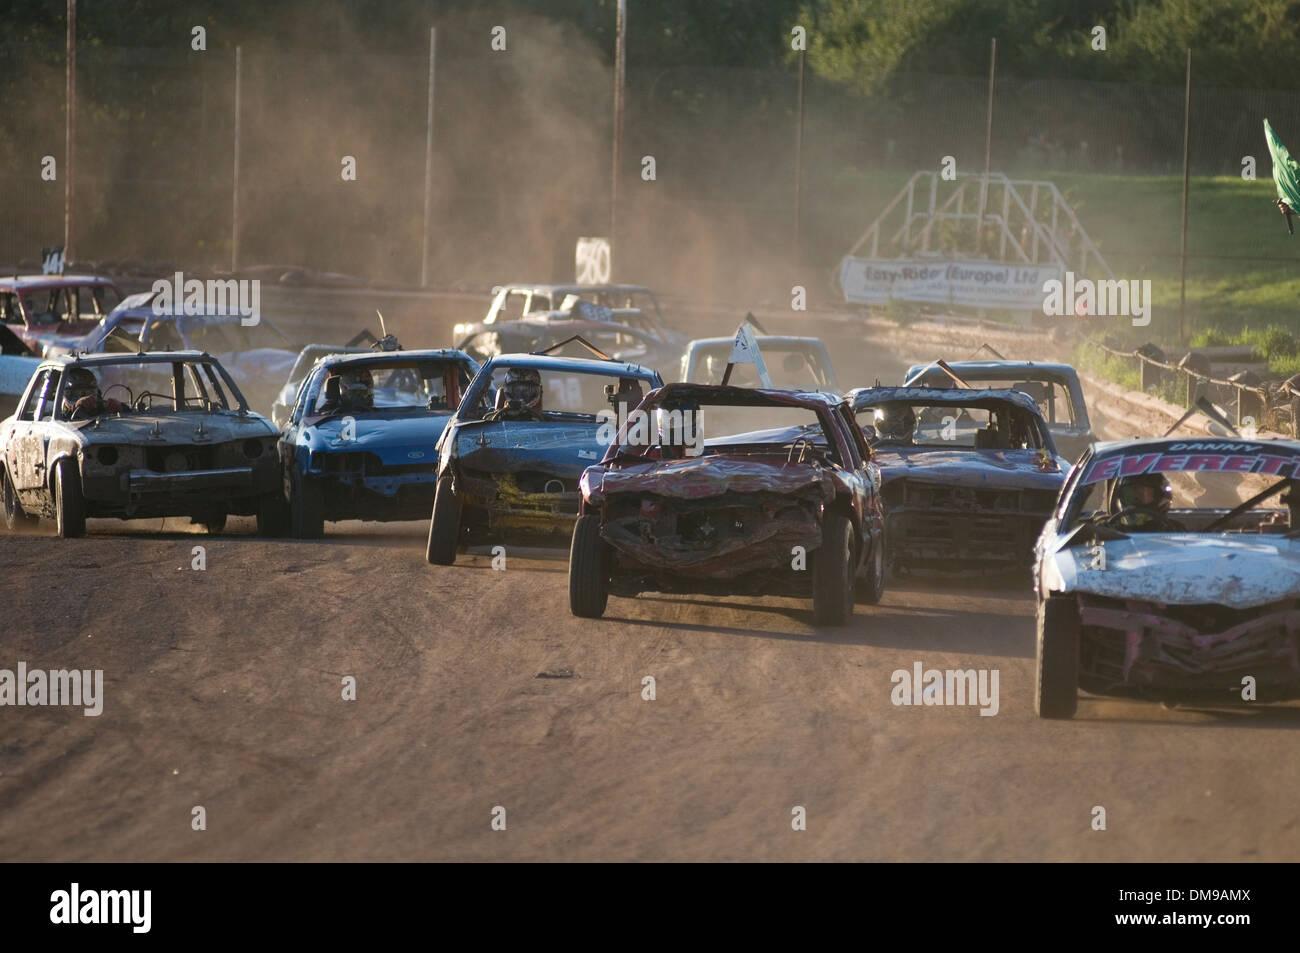 stock car cars racing race races banger bangers old junk scrap track ...